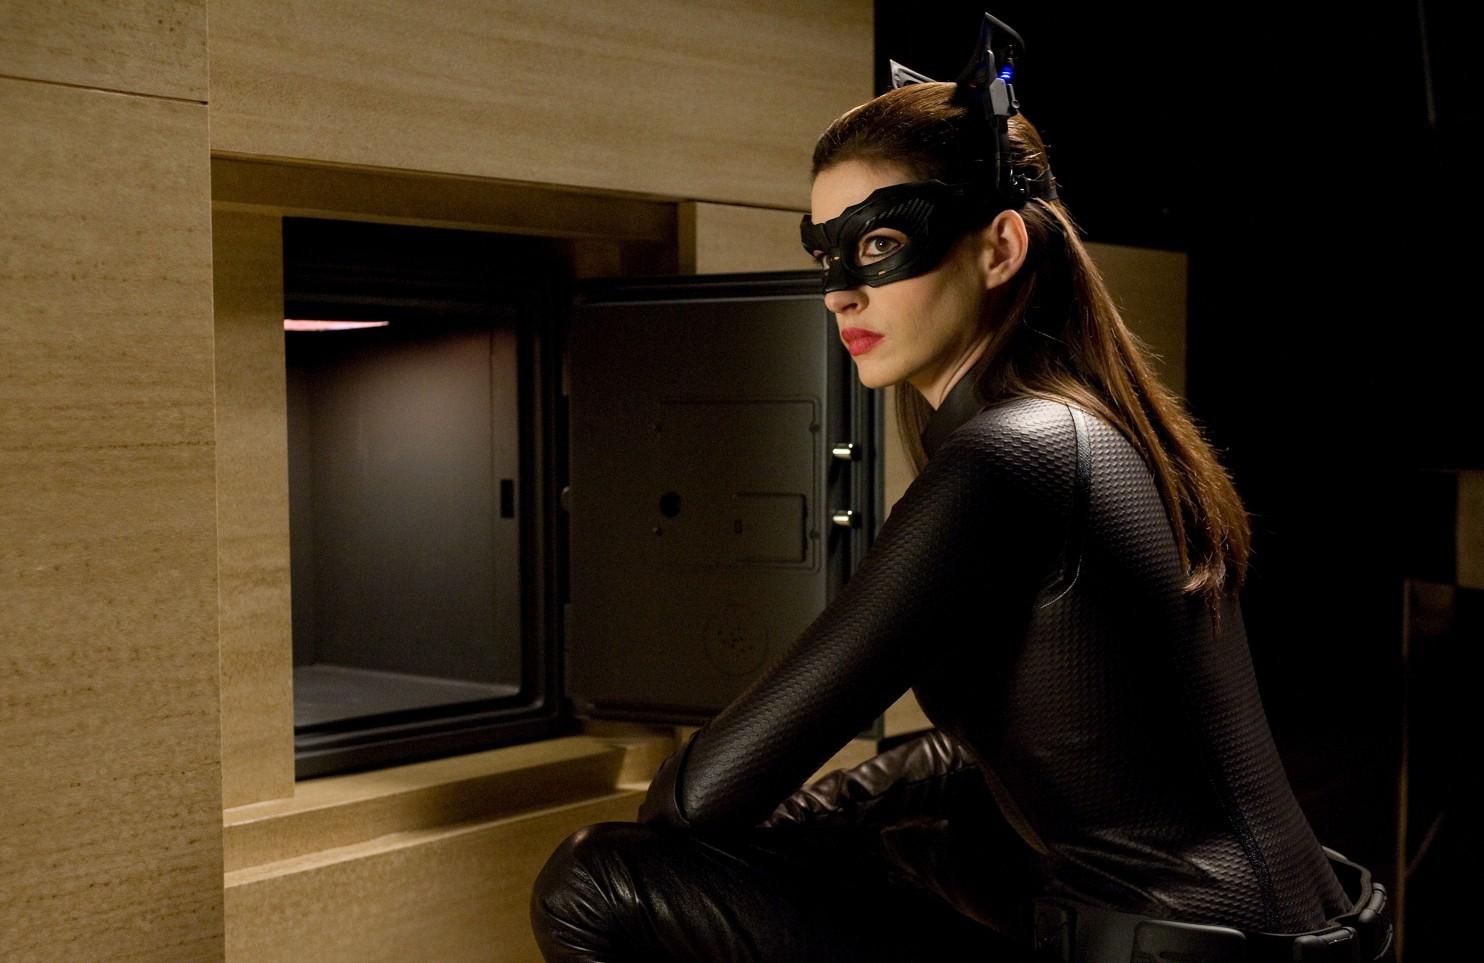 film_review_dark_knight_rises-085d2-4549.jpg